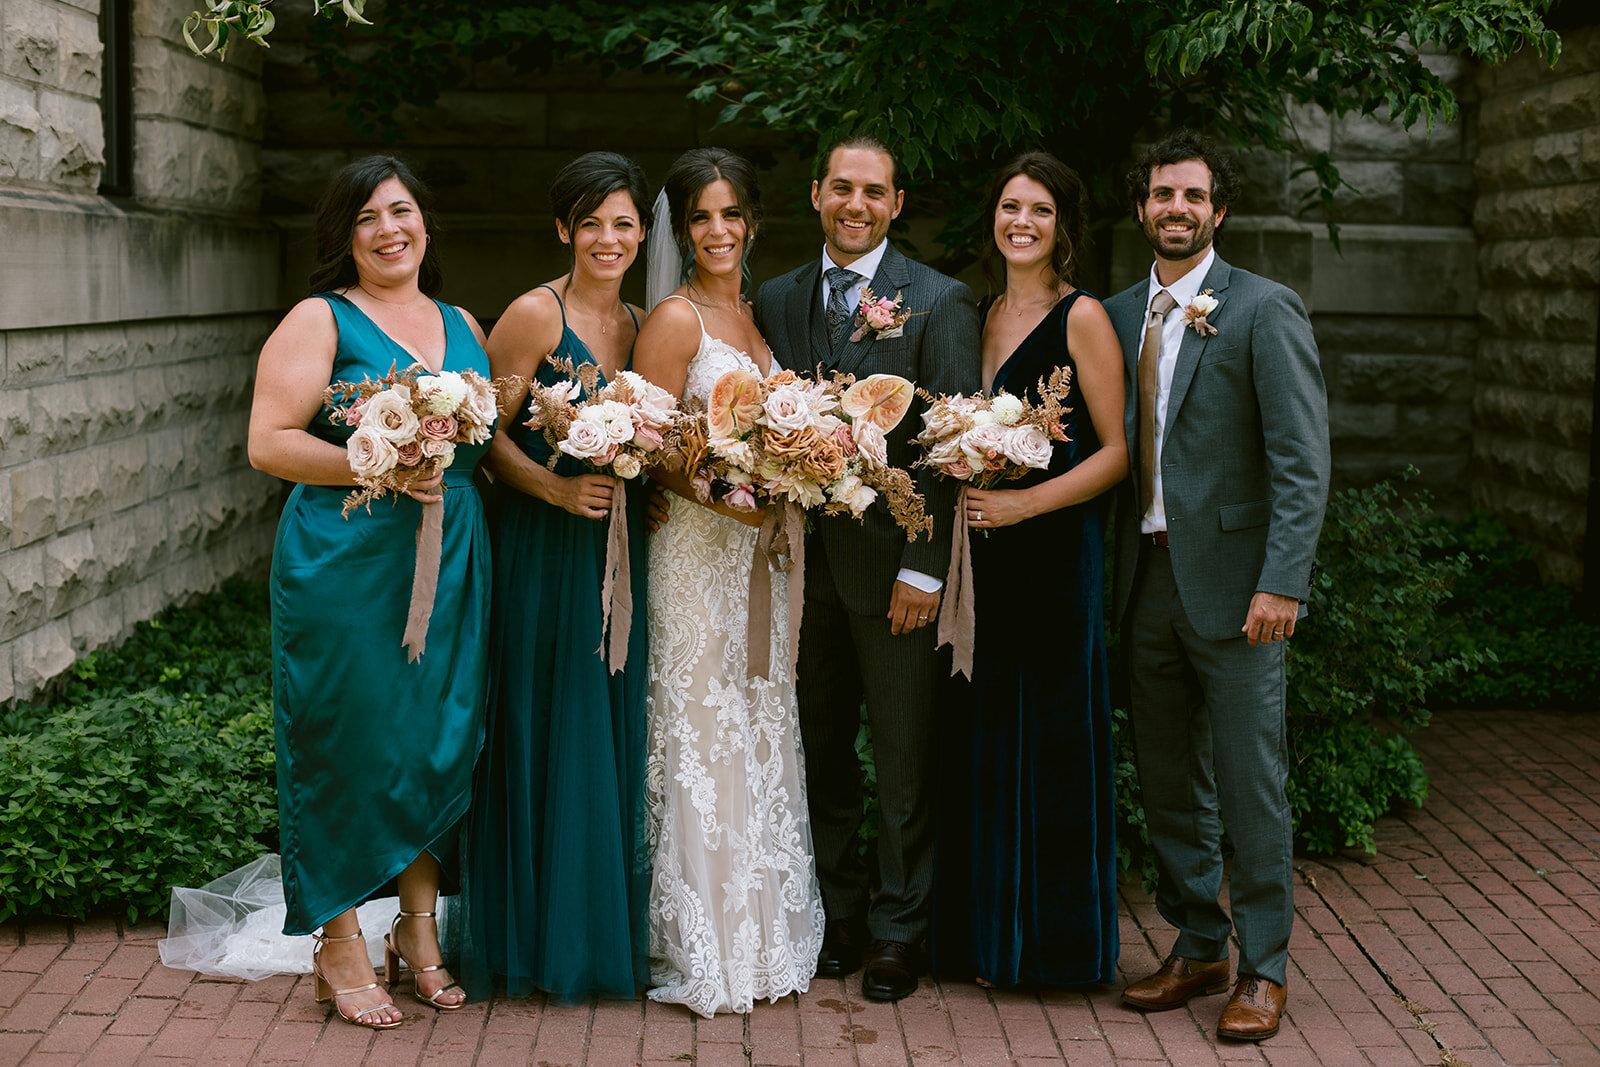 kera-anthony-wedding-previews-38.jpg